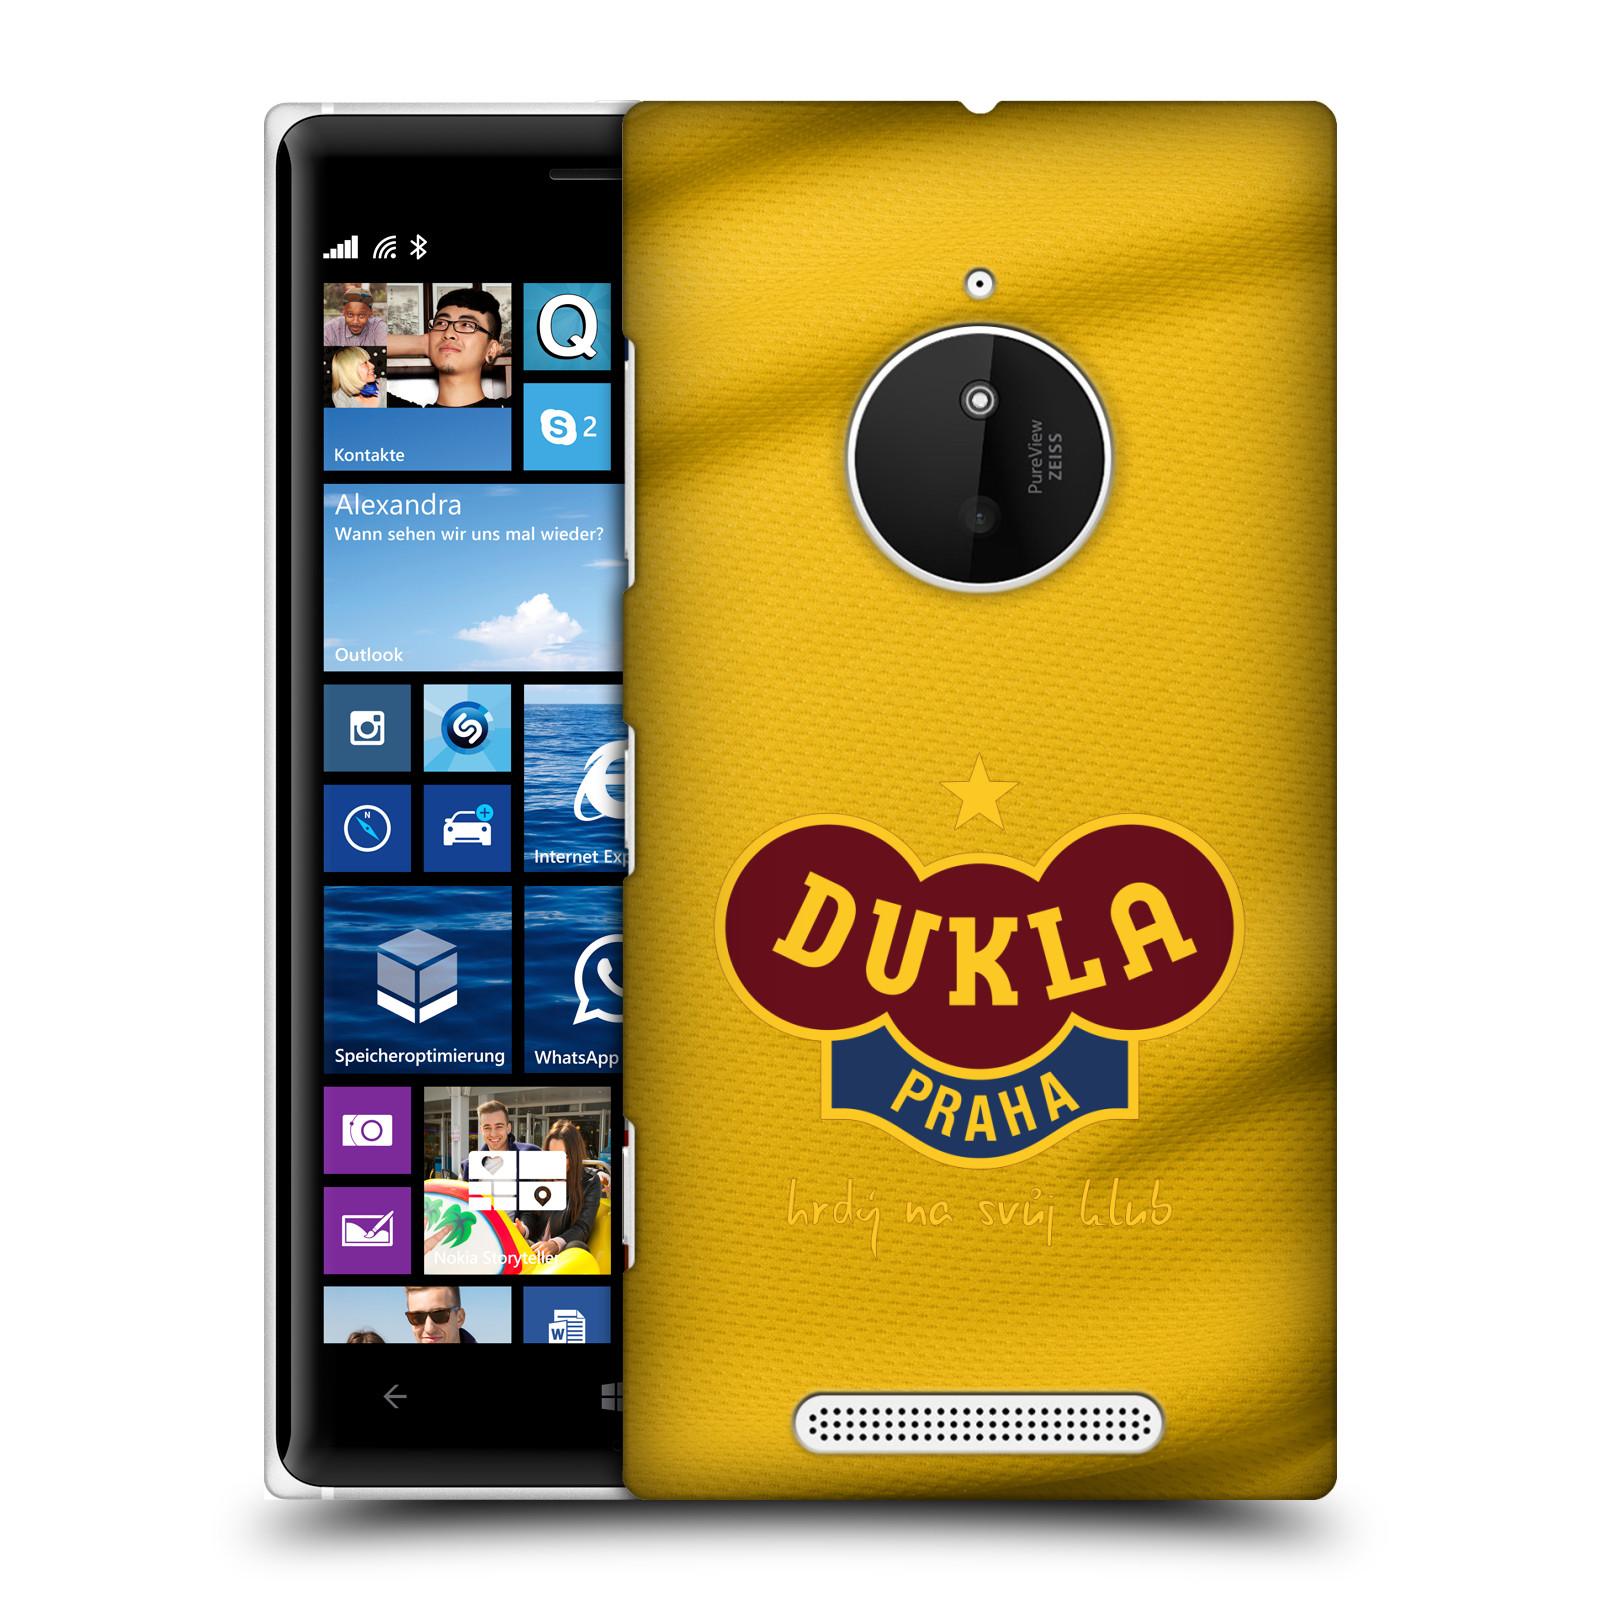 Plastové pouzdro na mobil Nokia Lumia 830 - FK Dukla Praha - Žlutý dres